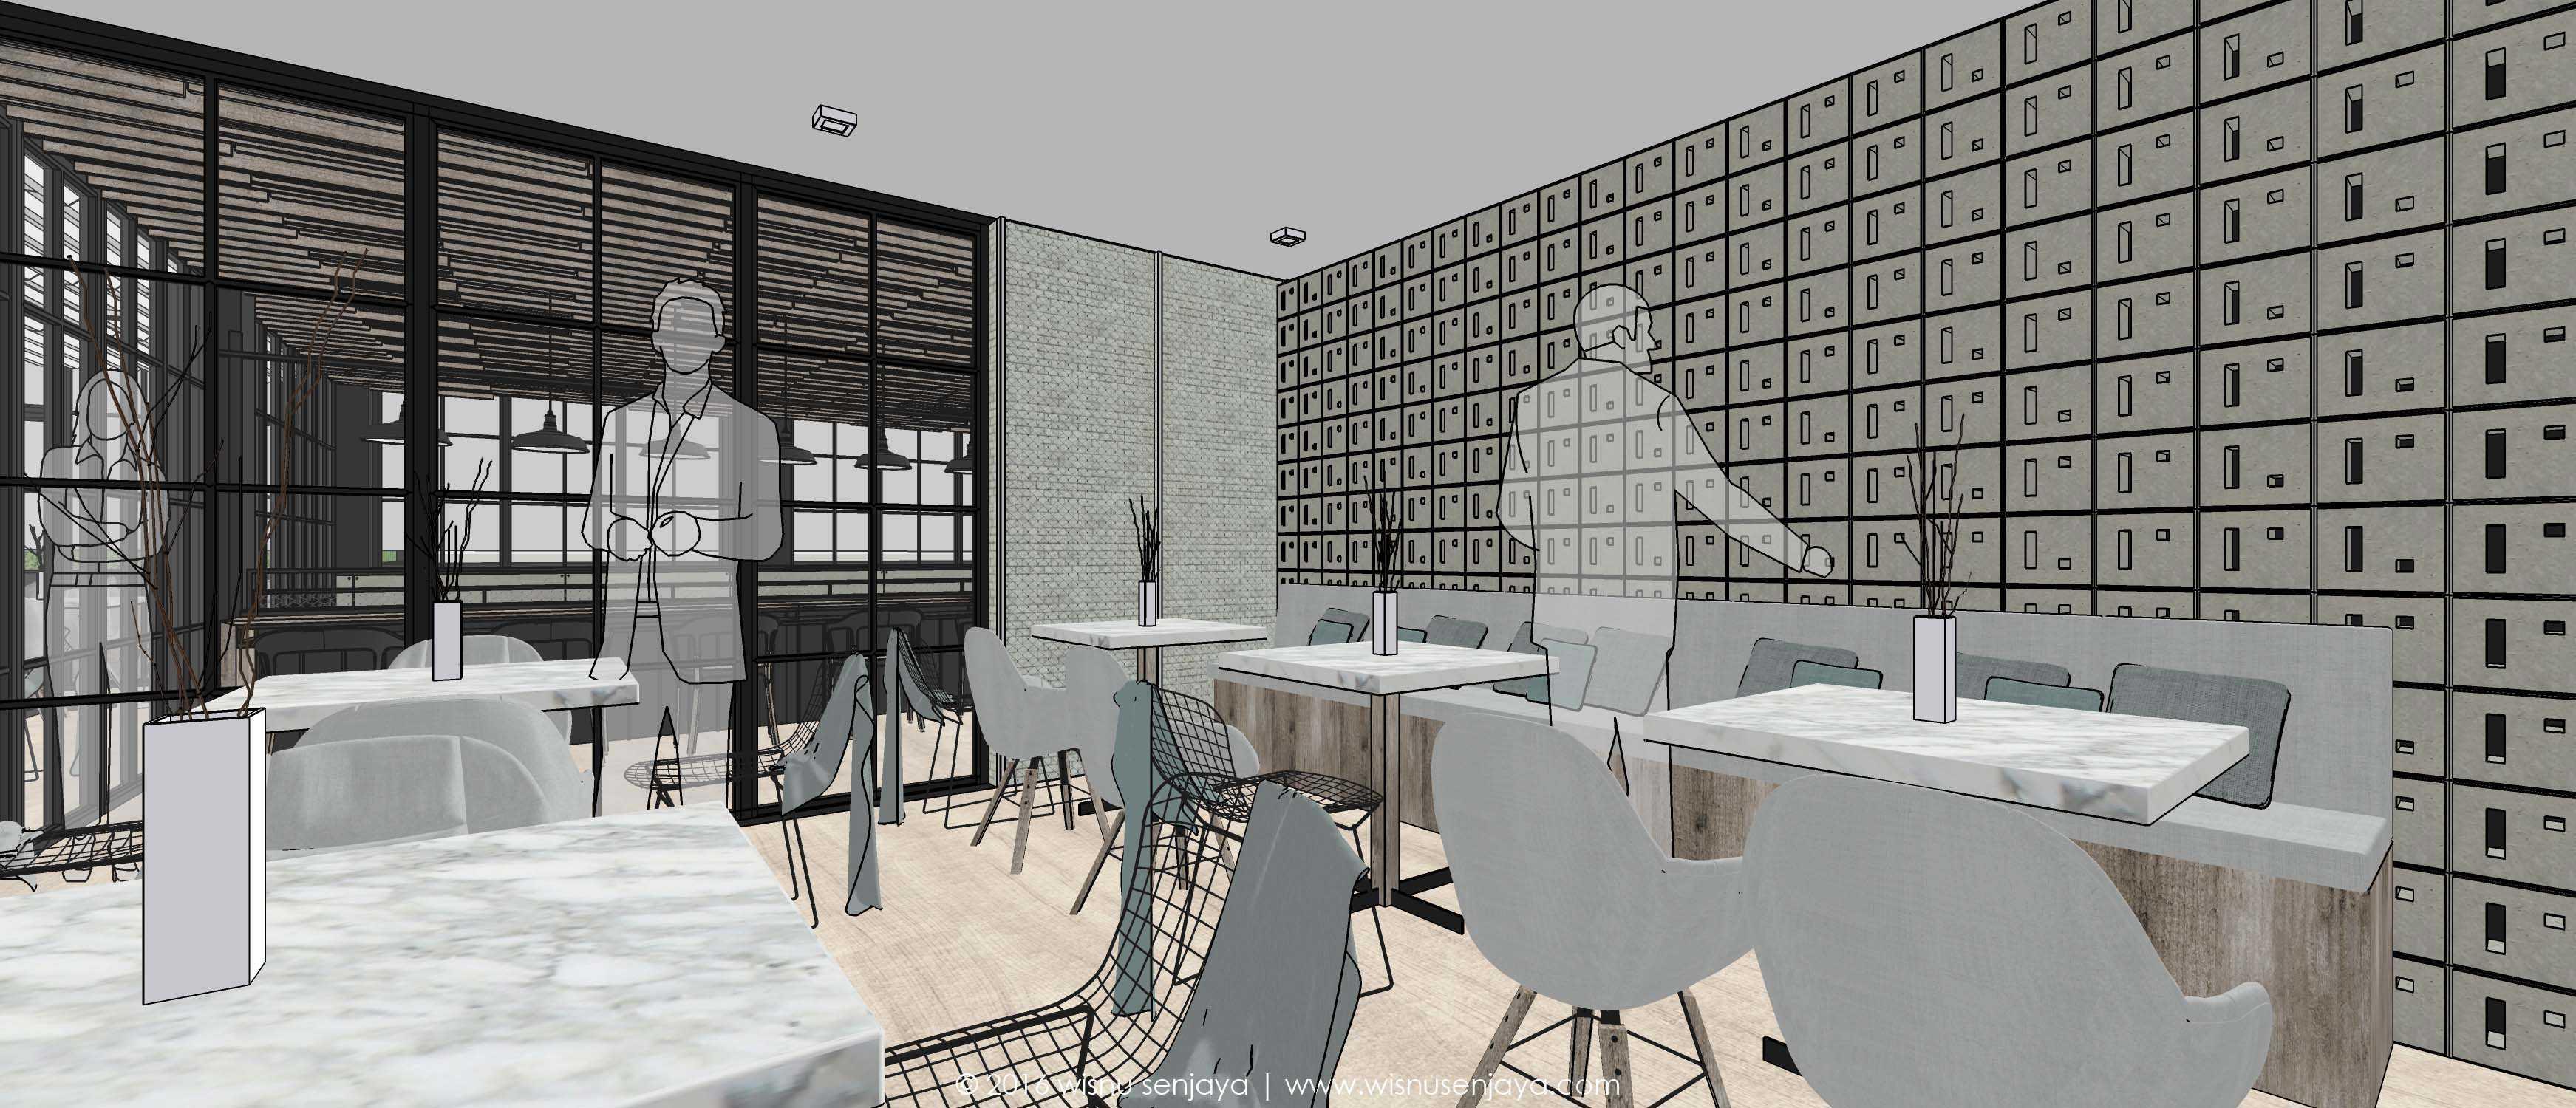 Wisnu Senjaya Architects Coffee Shop In Scbd Jakarta Jakarta Int7   29990